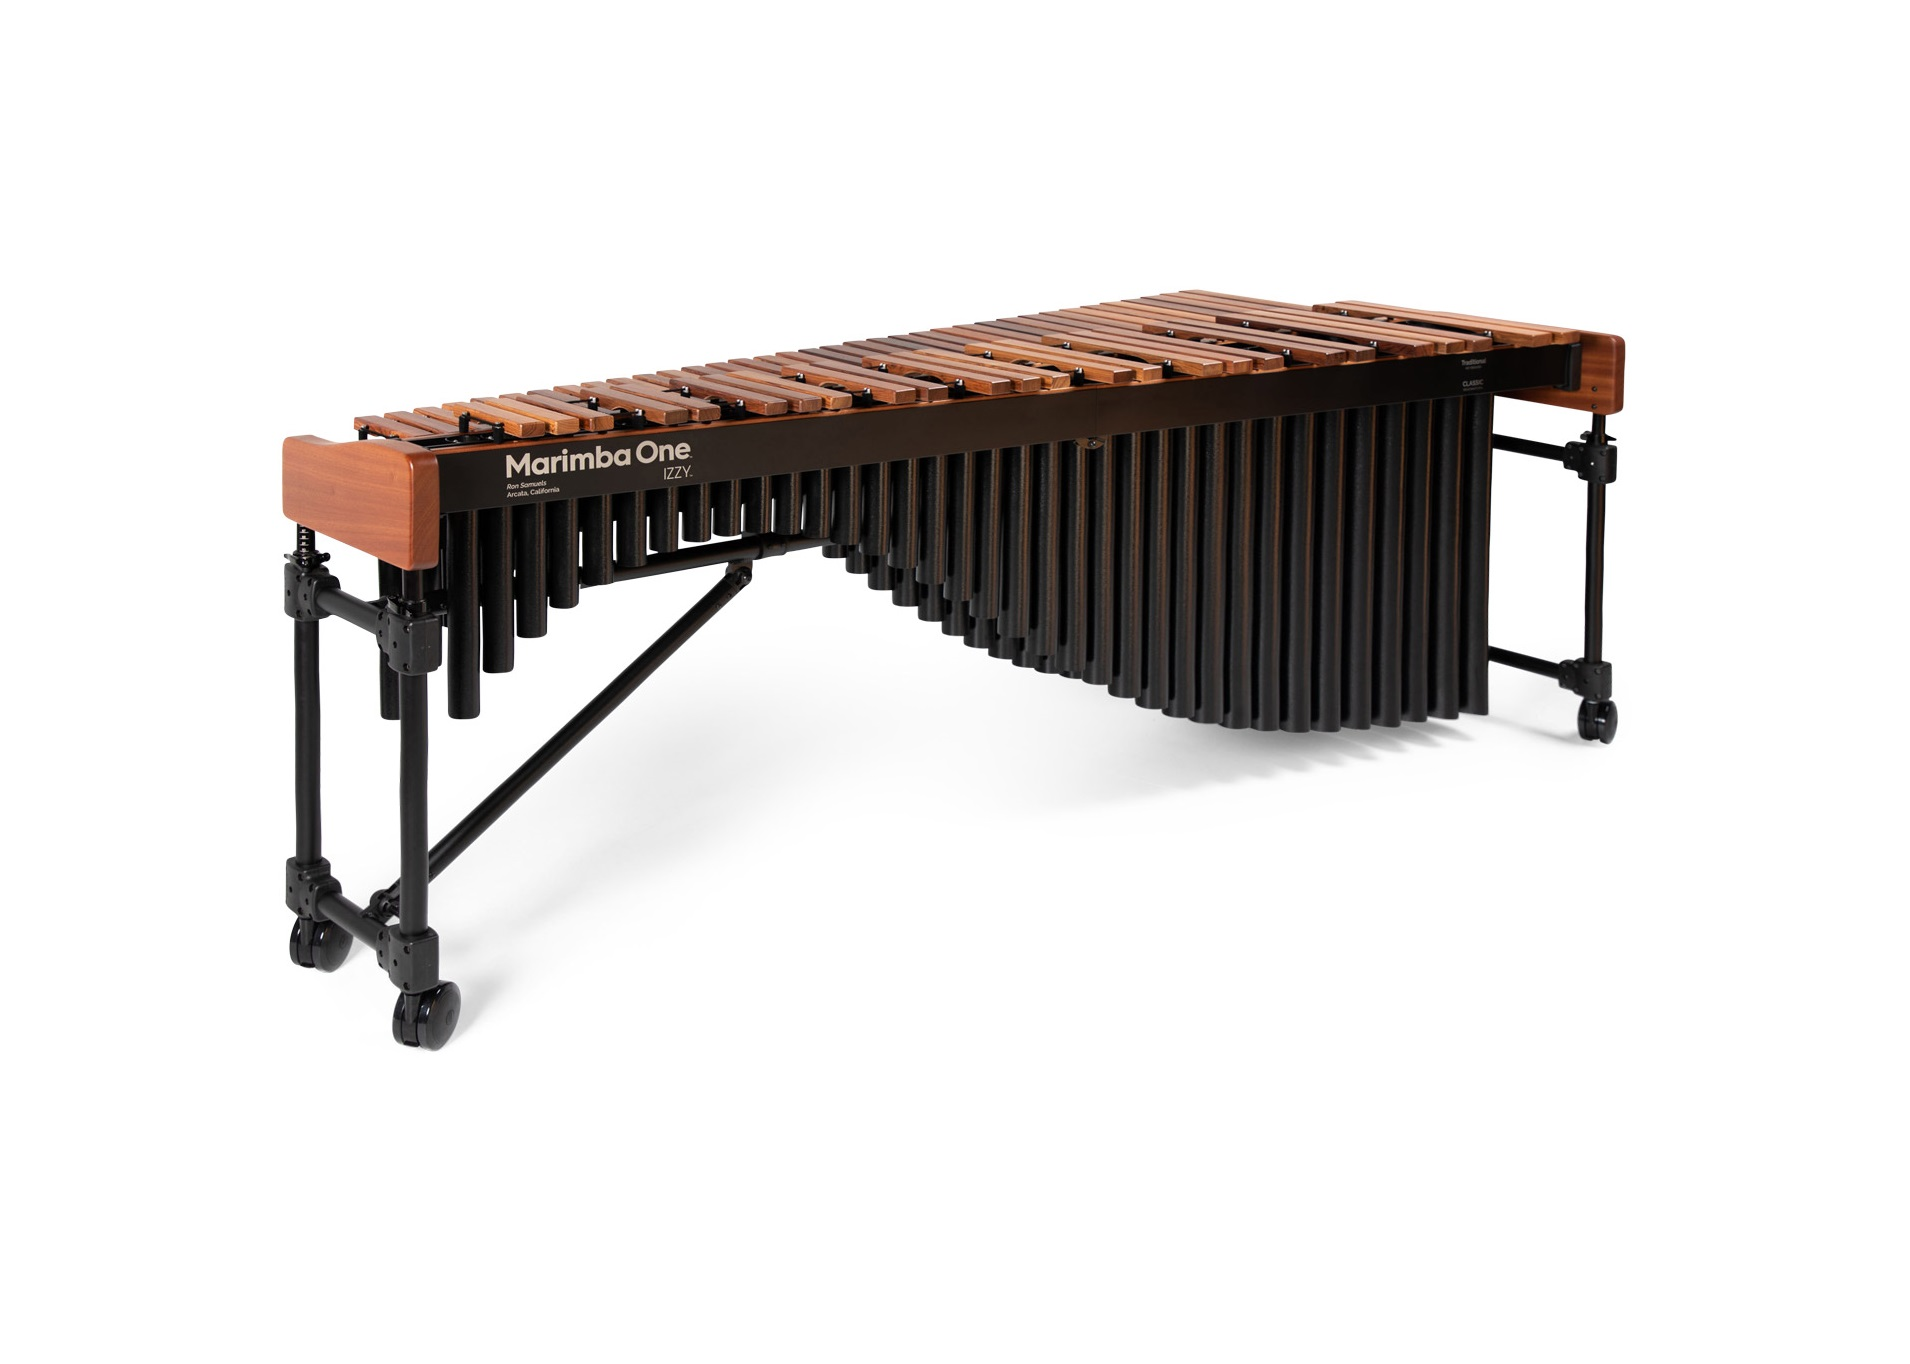 Marimba One Izzy Marimba